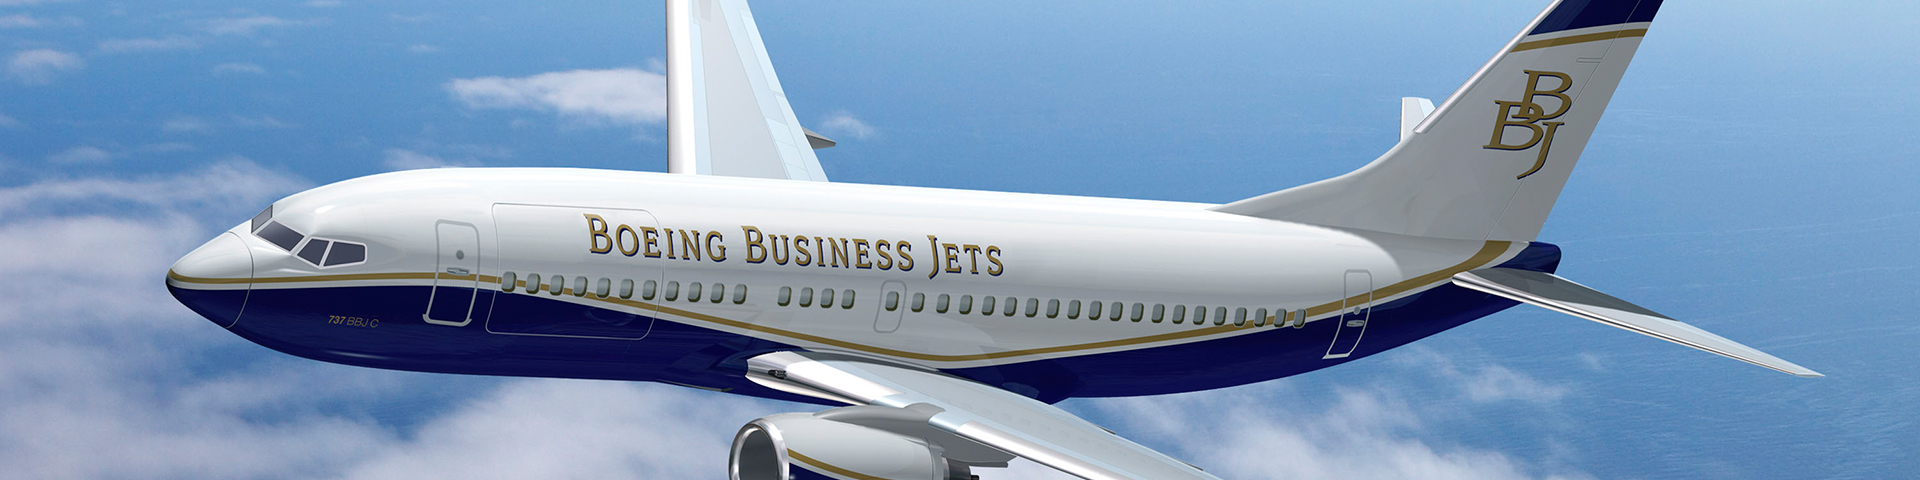 Boeing Business Jet BBJ Private Jet1 - Boeing Business Jet (BBJ) Private Jet